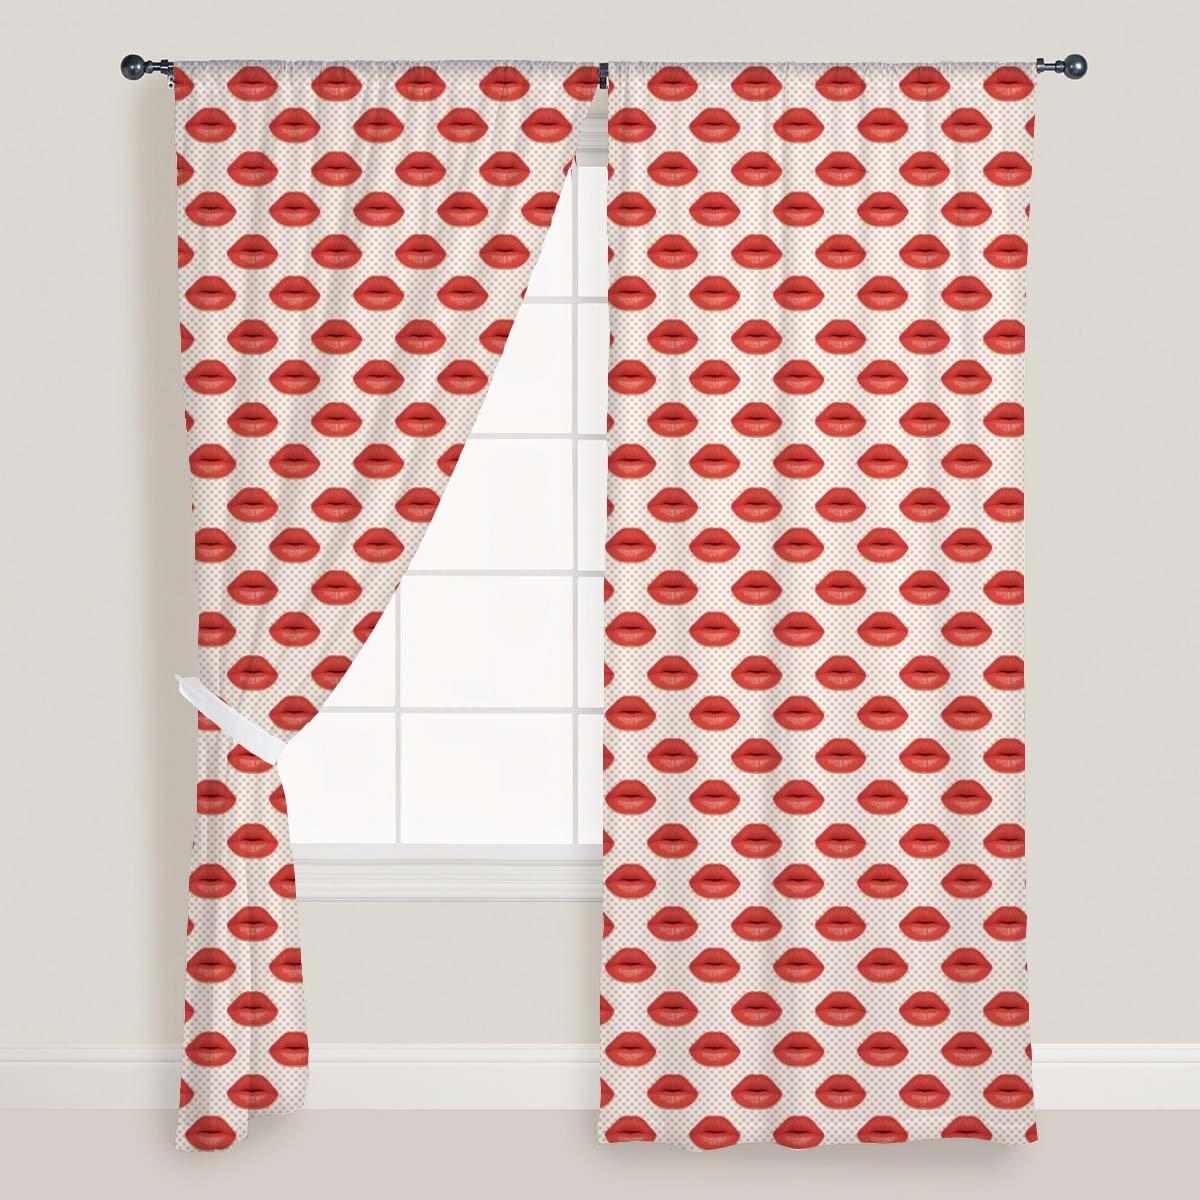 AZ Red Lips Door & Window Curtain Satin 4feet x 8feet; SET OF 3 PCS